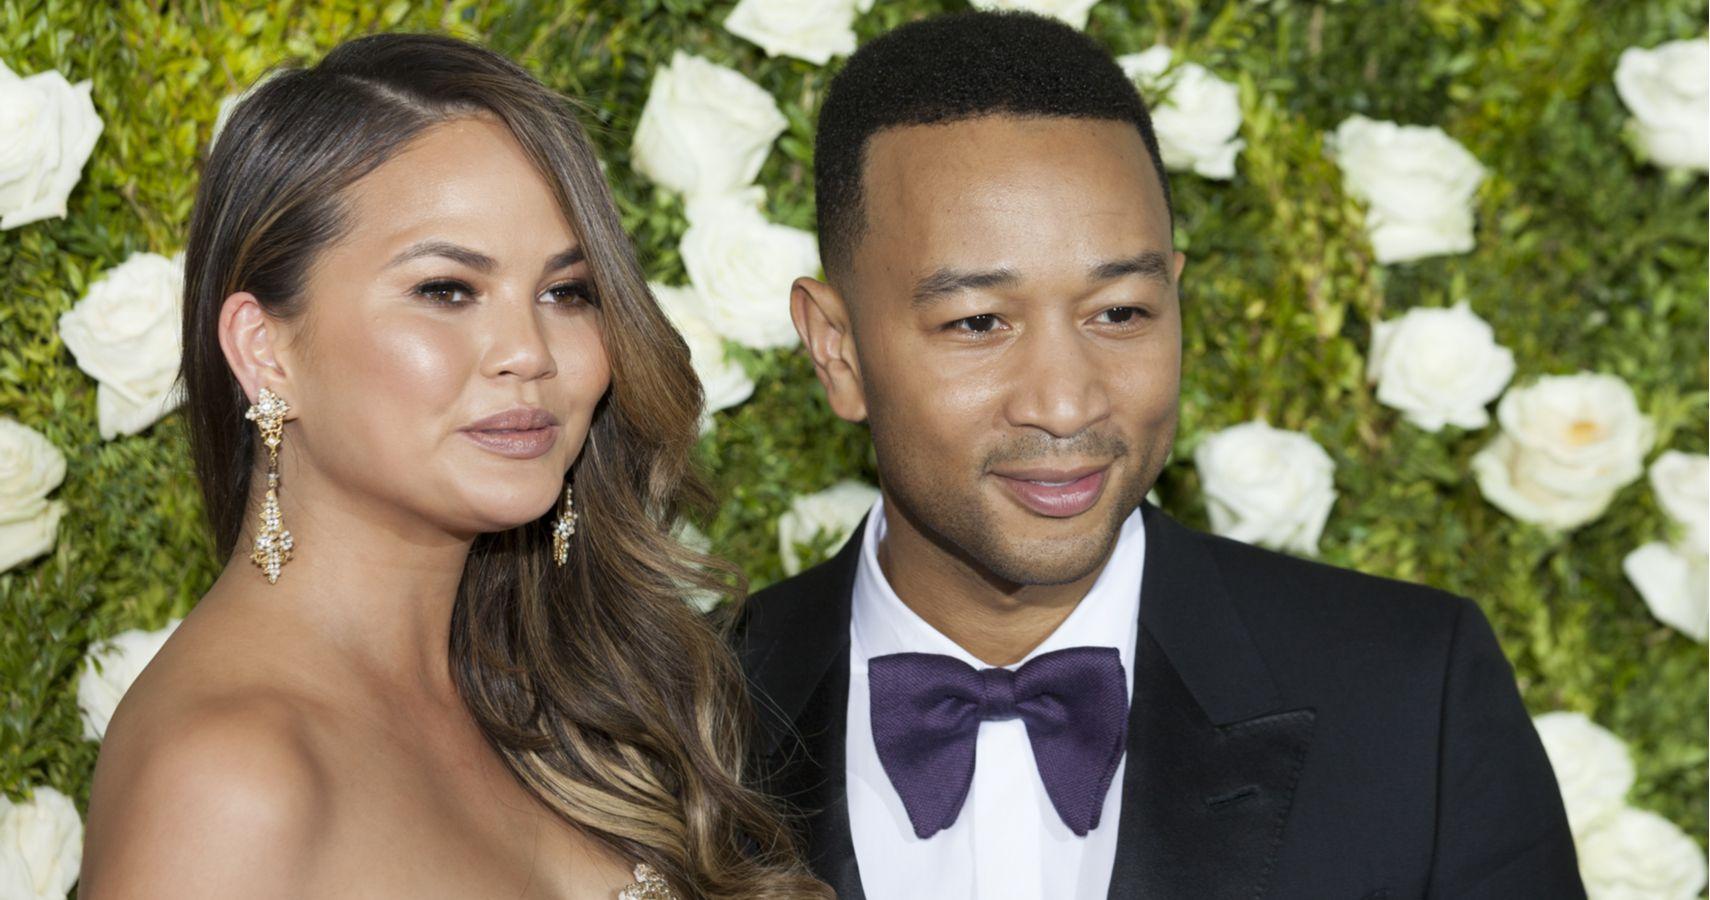 Fans Demand 'The Voice' Cancel John Legend Over Chrissy Teigen's Behavior